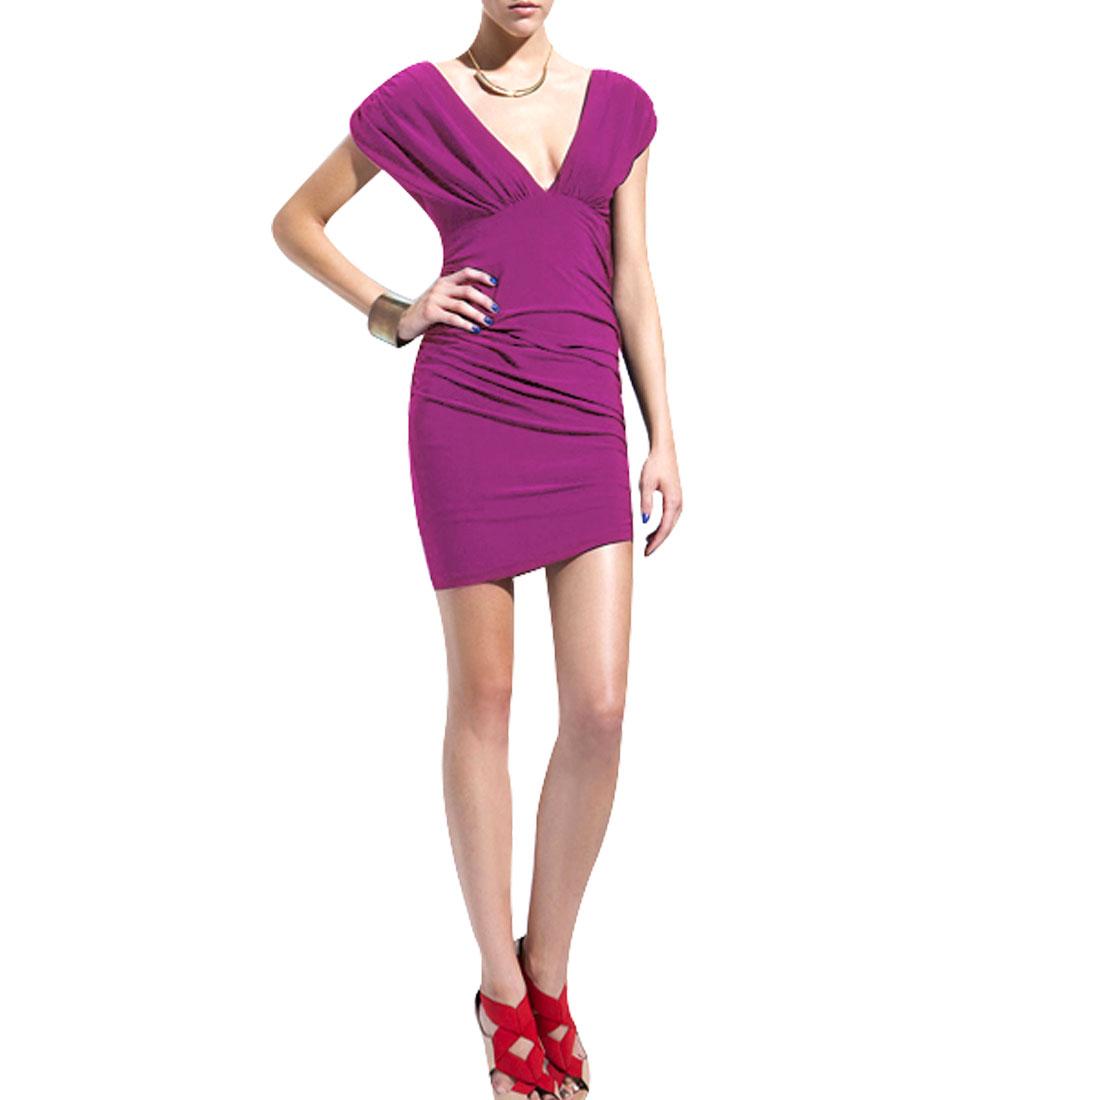 Ladies Sleeves Steath Waist Ruched Side Mini Dress Fuchsia XS